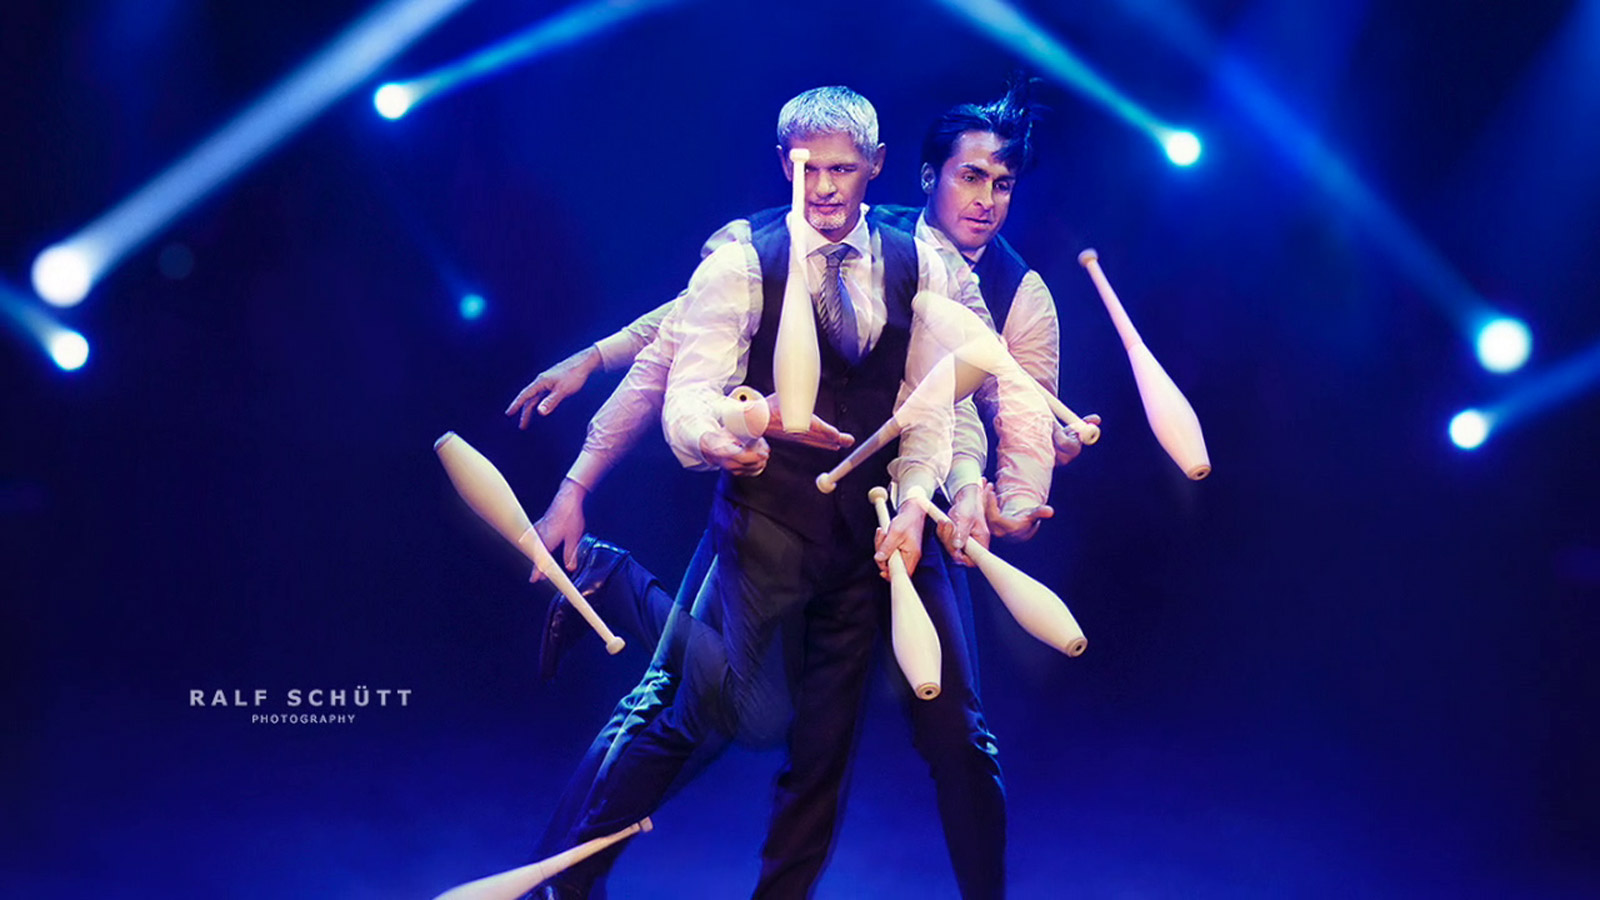 bg 03 - Entertainment / Gala- & Dinnershows